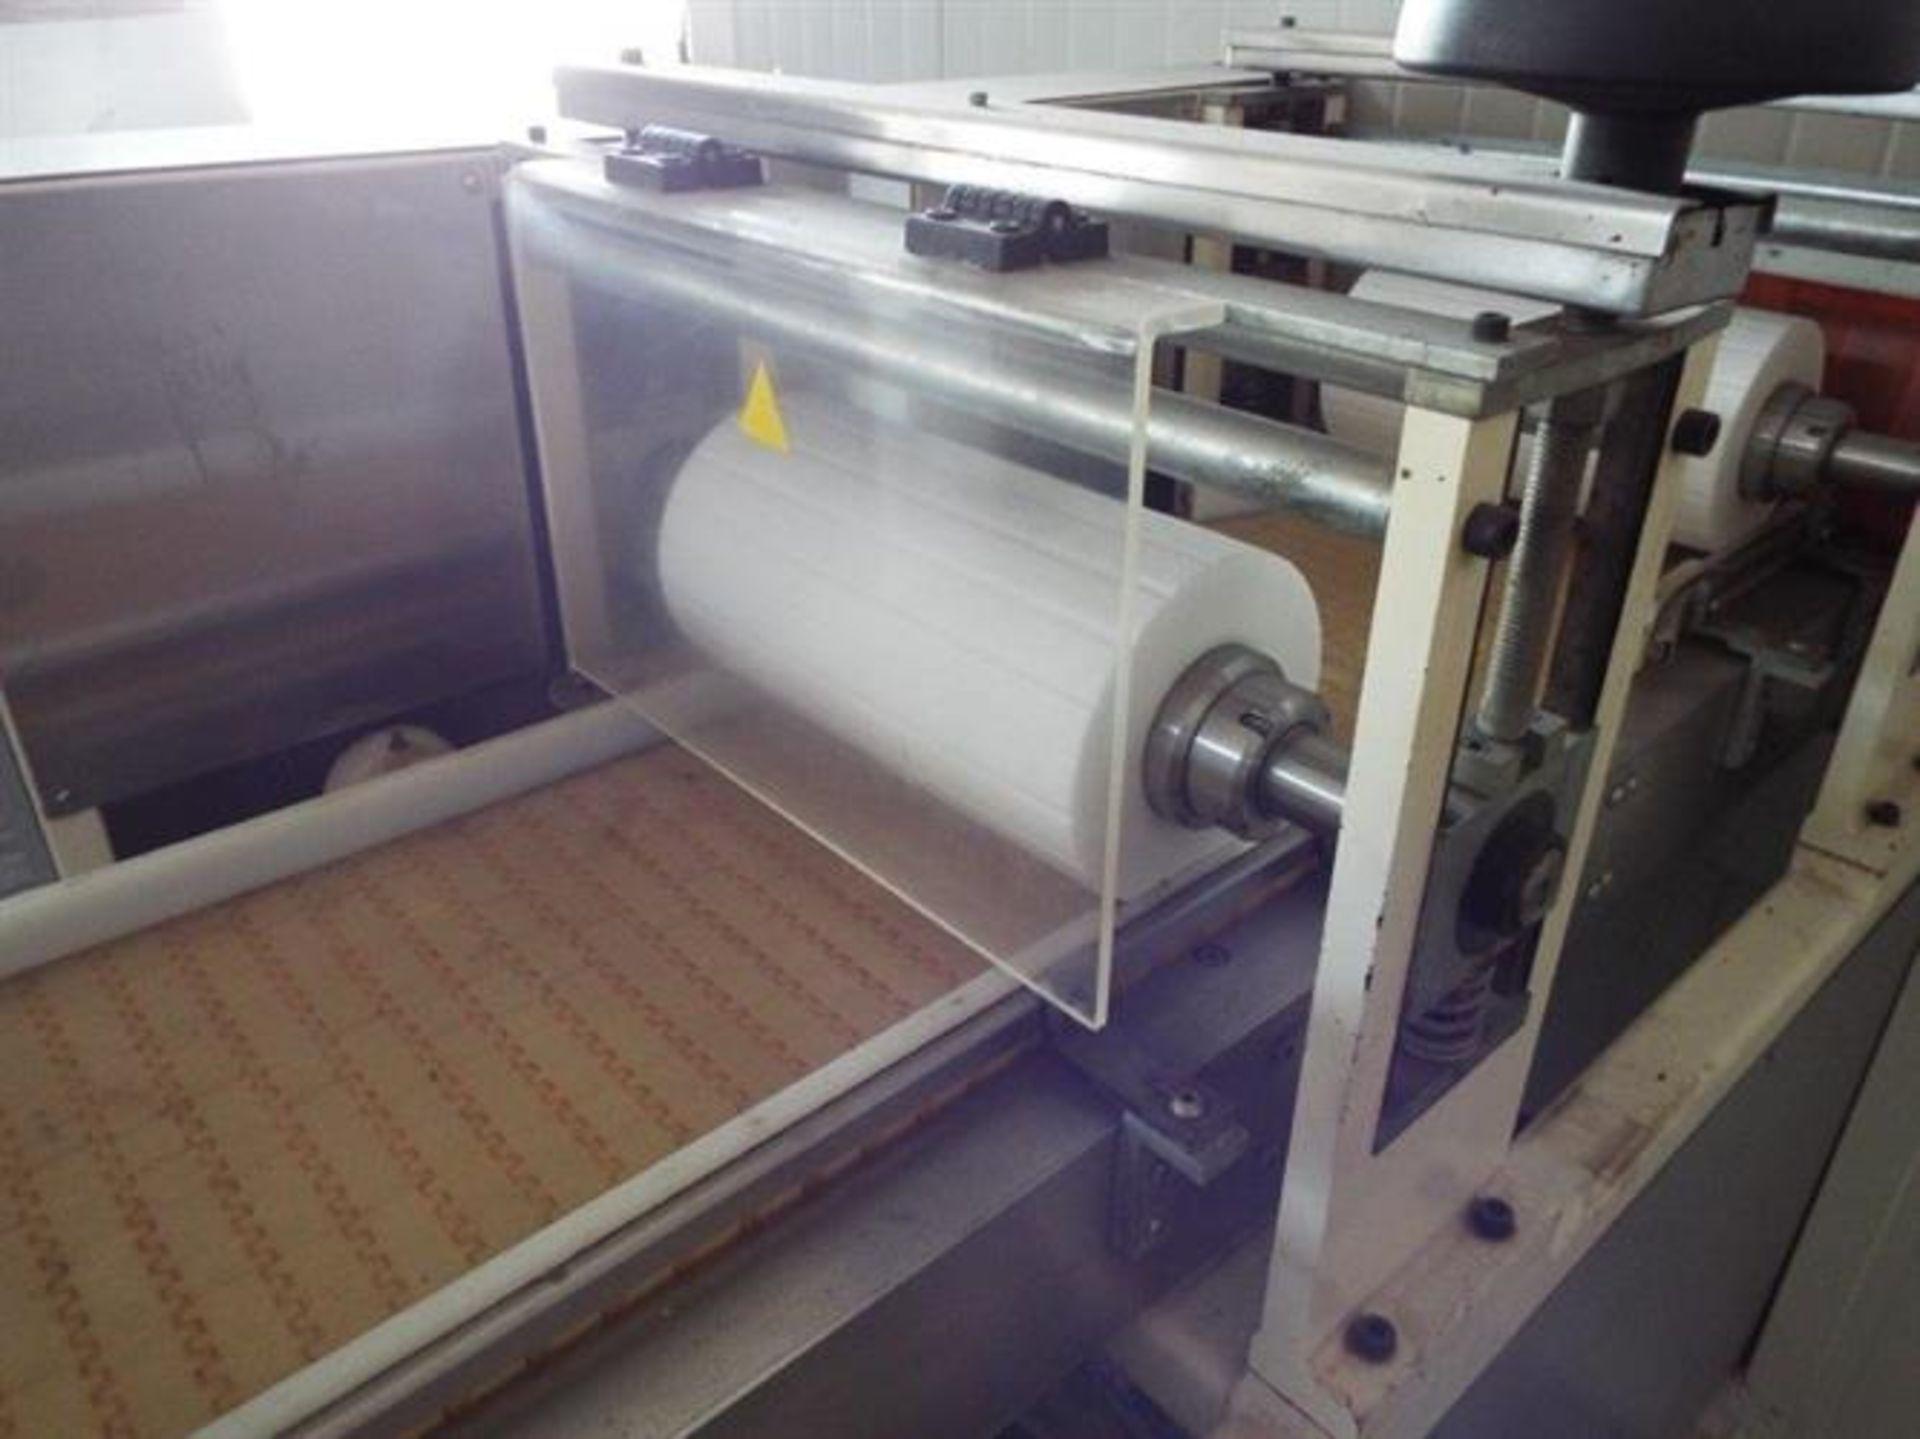 Tecmaq 290 mm Wide Slab Forming Line - Model TM-6H built 2012 - Three sets of gauging/sheeting - Image 14 of 30